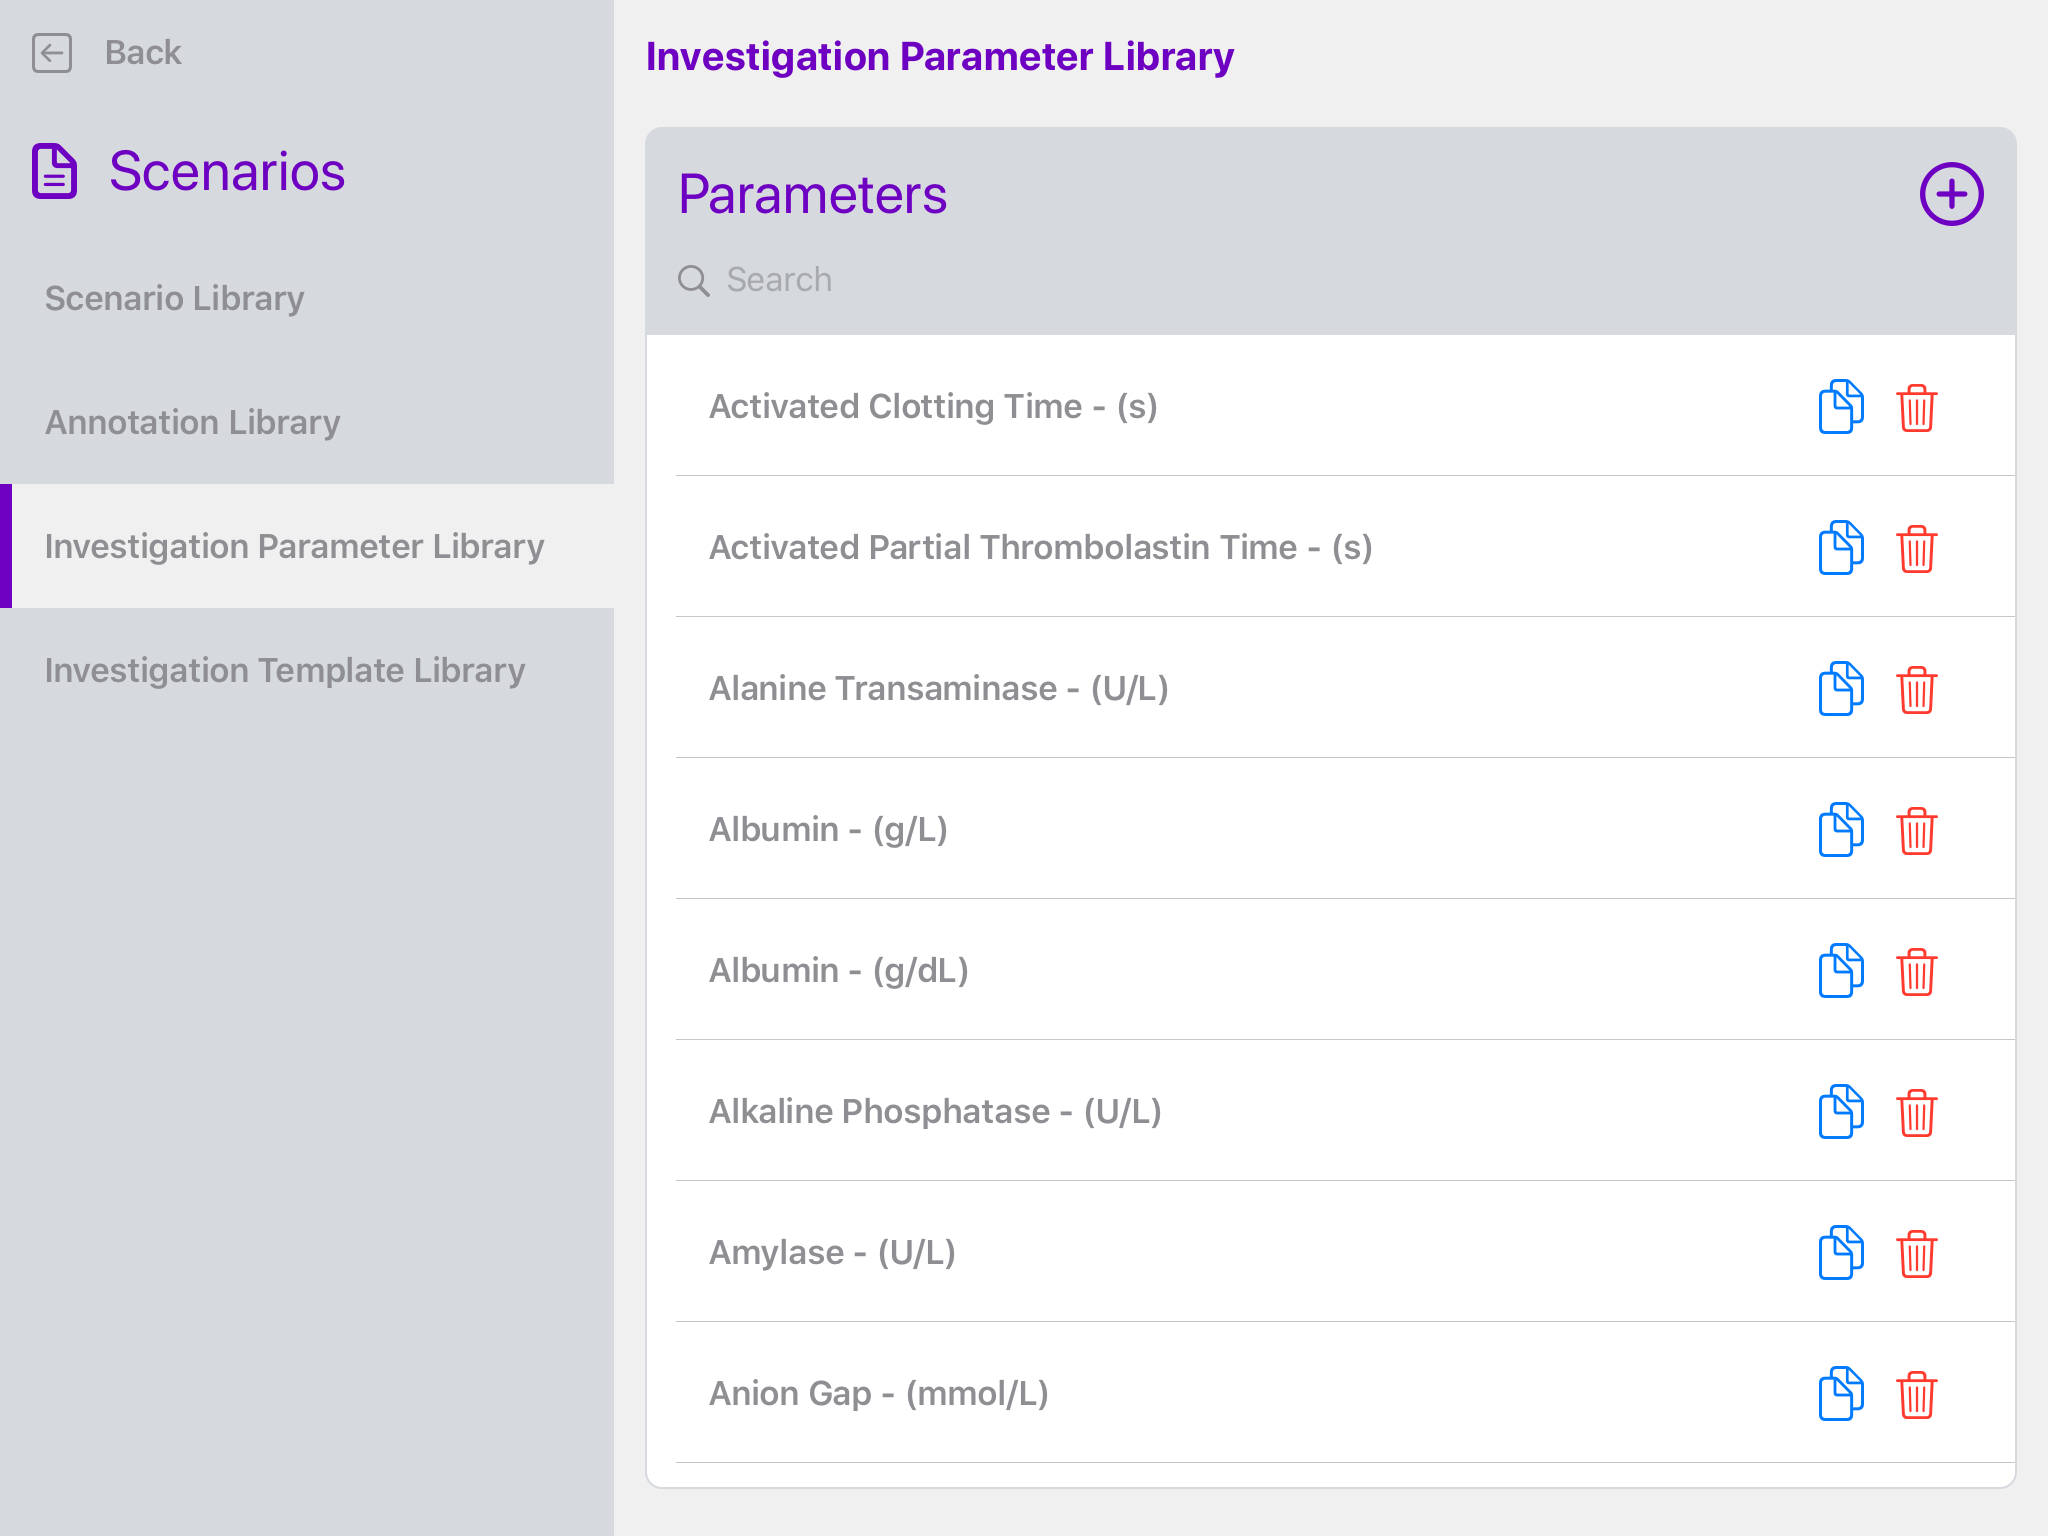 Scenarios_Investigations_parameter.PNG